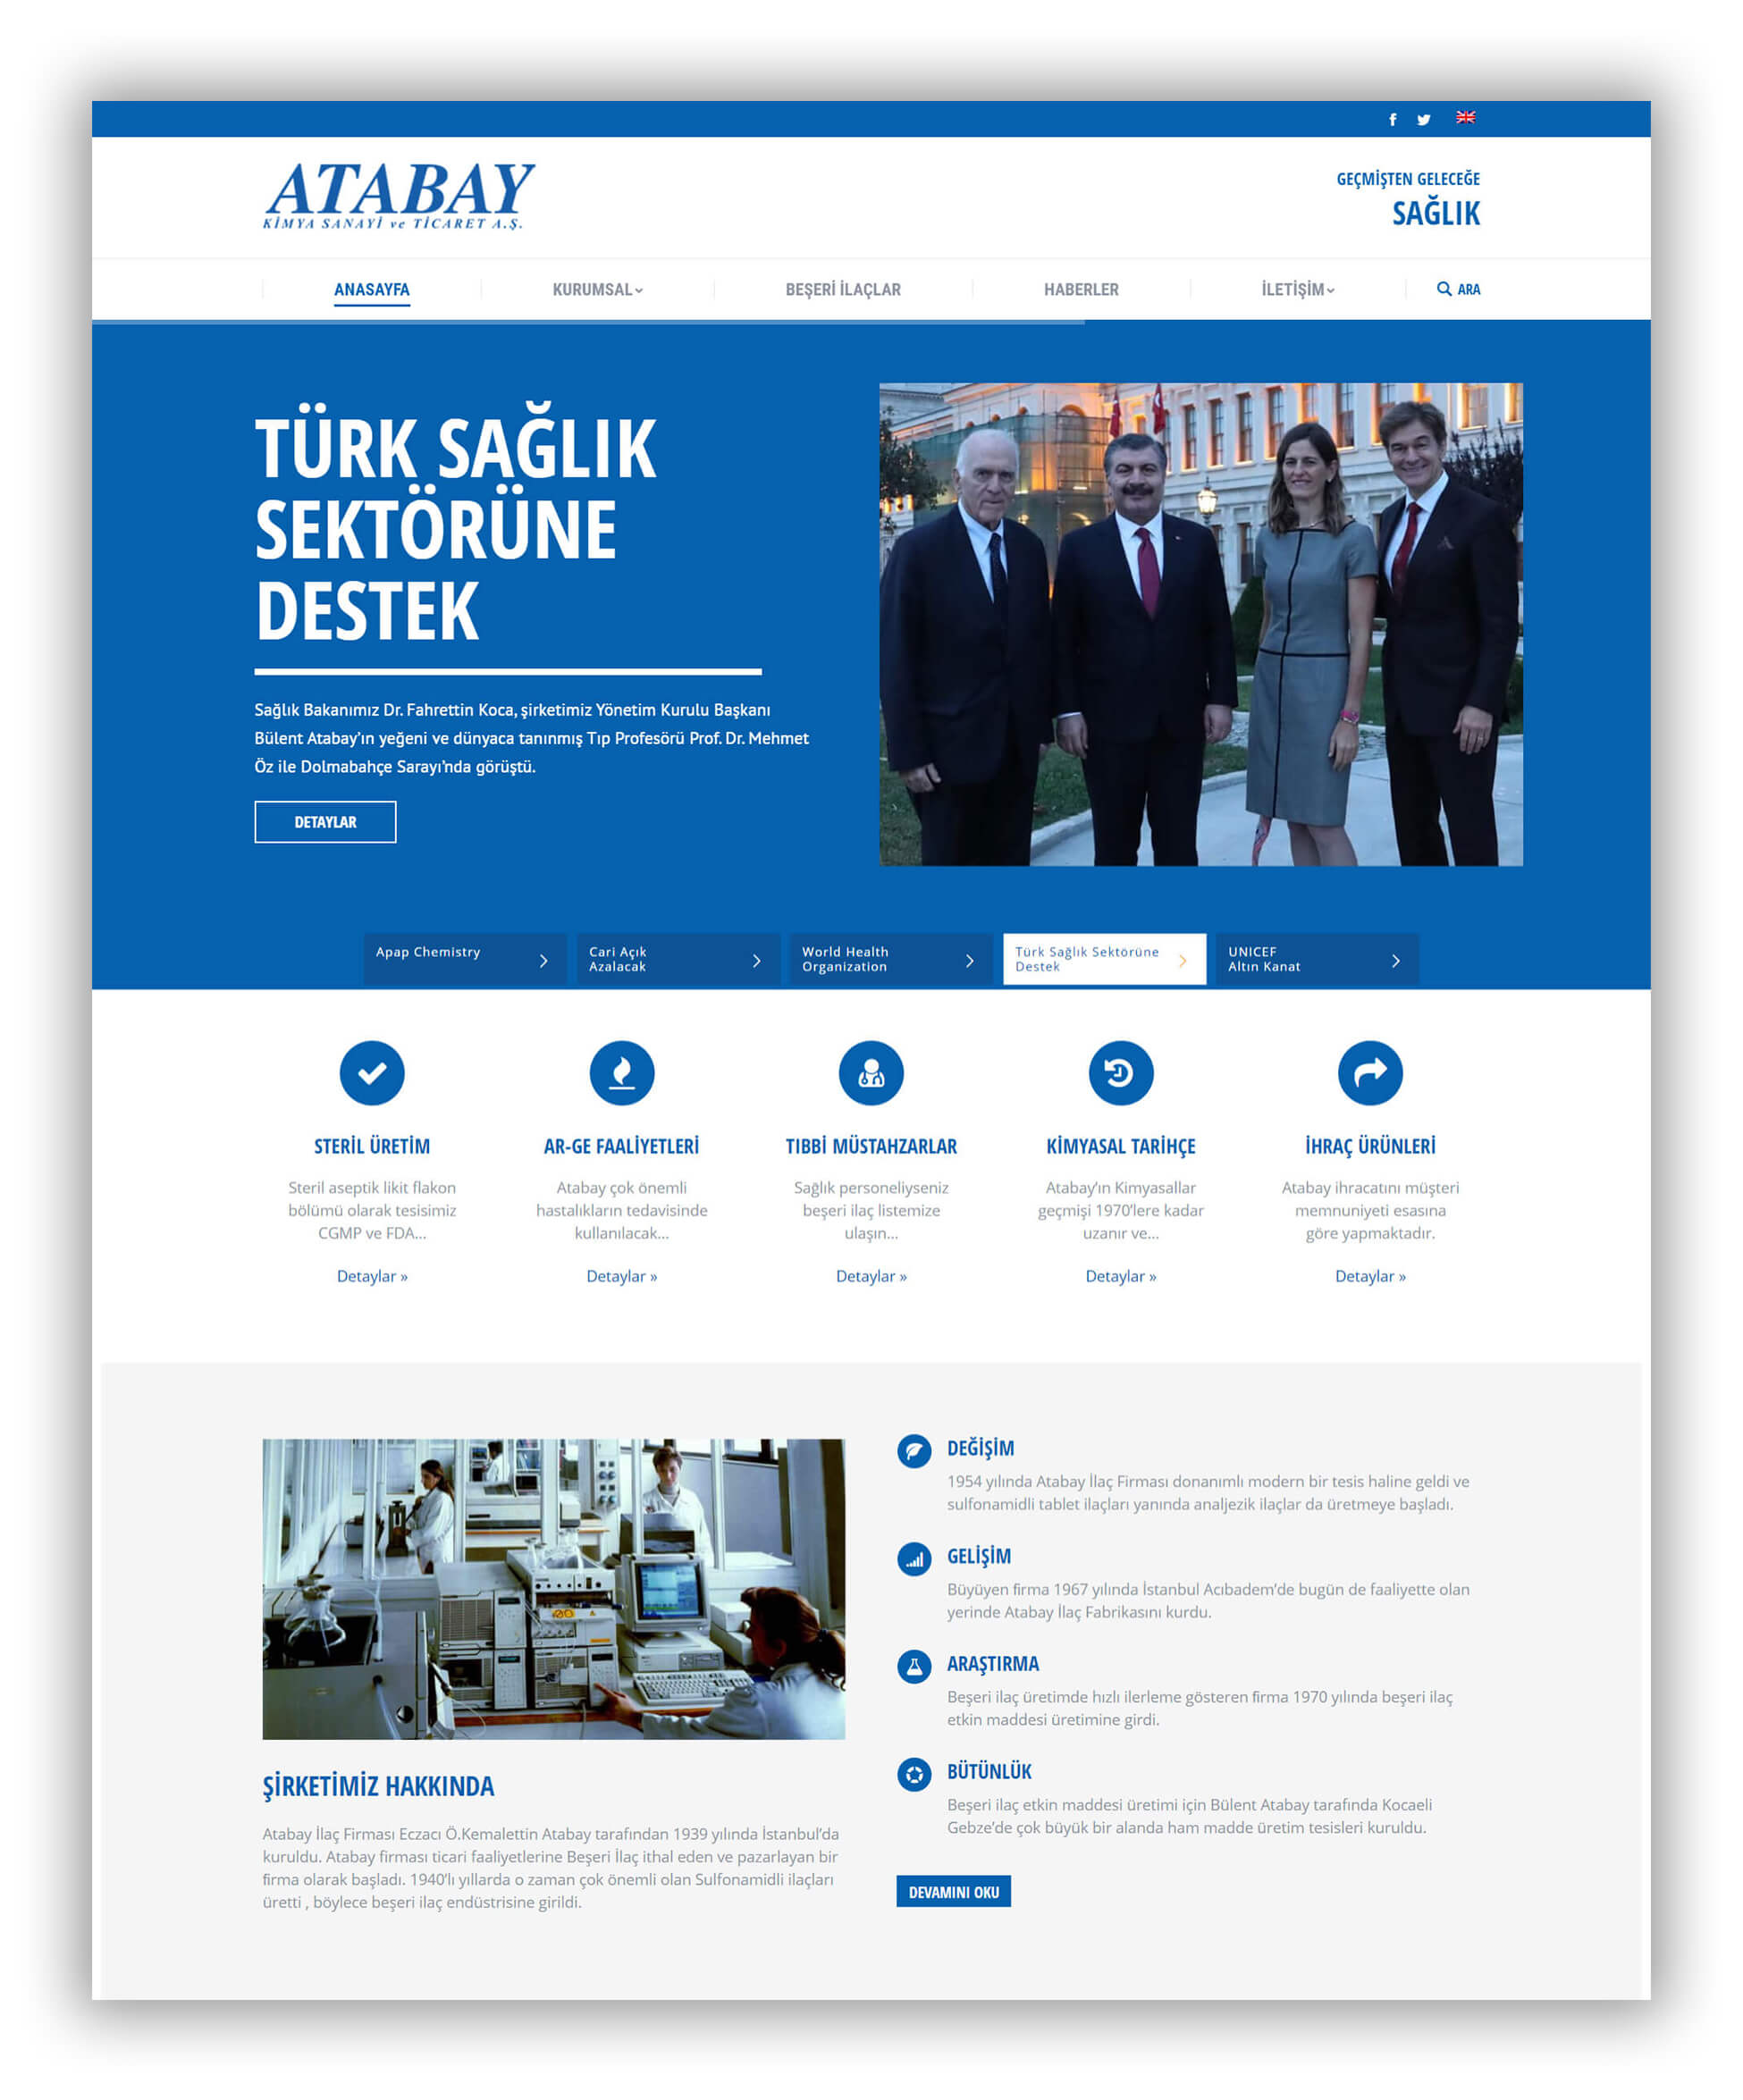 IRM Dijital projeler Atabay ilaç ana sayfa